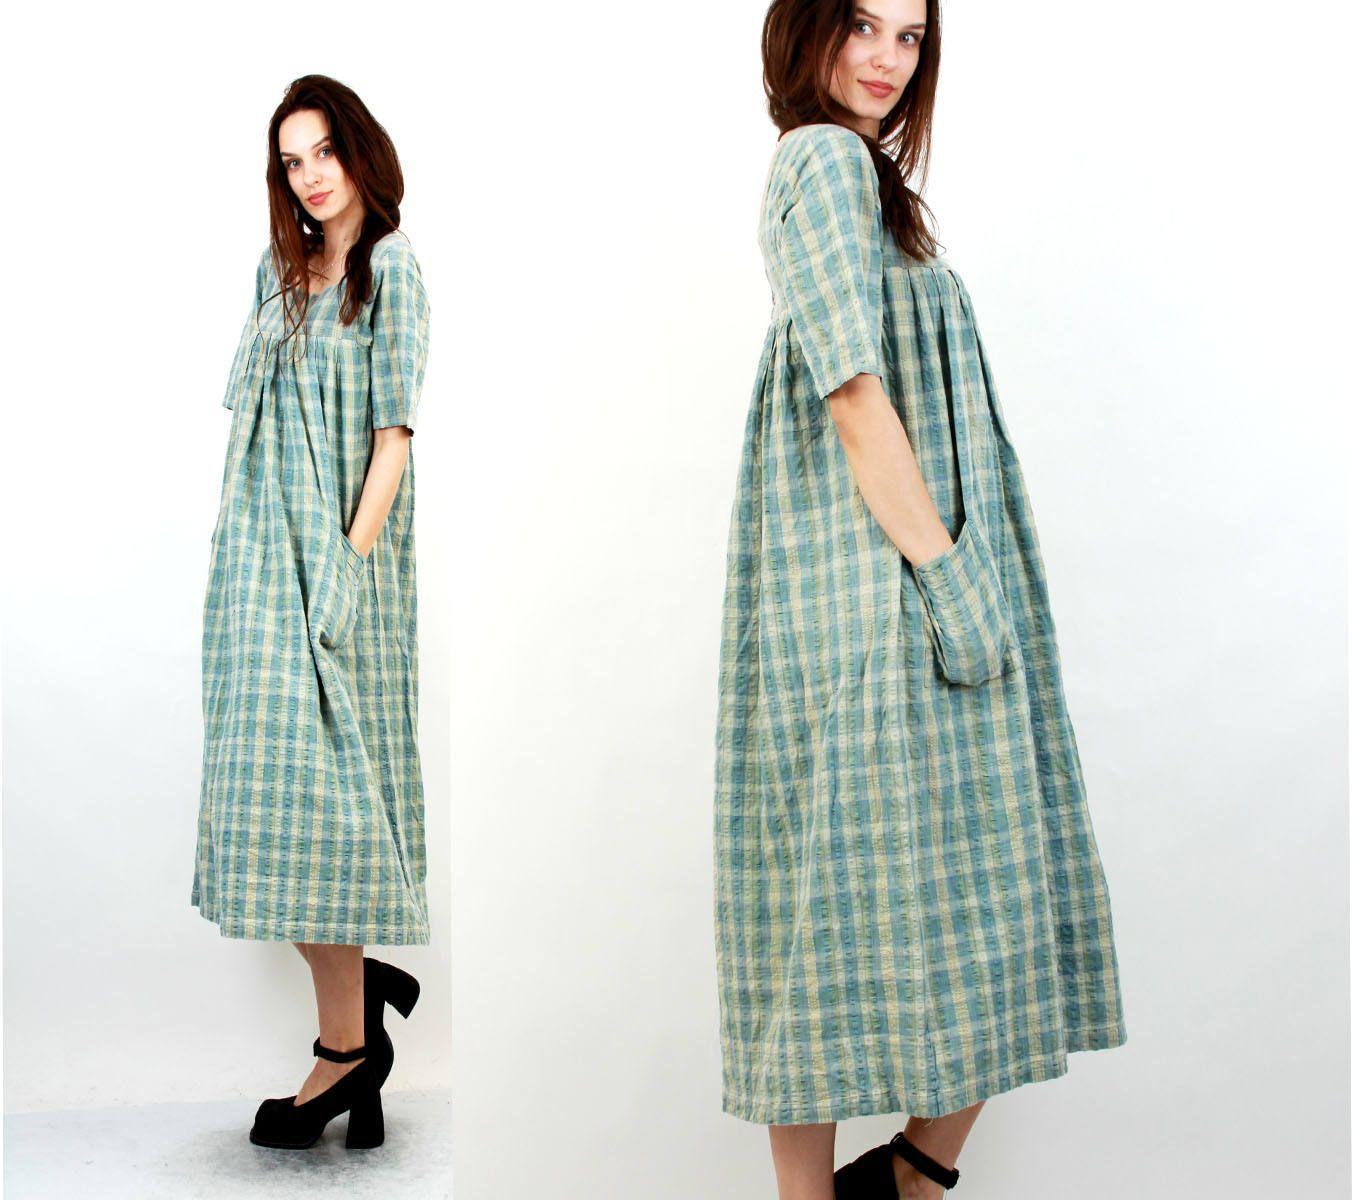 Plaid Cotton Baggy Dress / Vintage Baggy Dress / Summer Dress / Pregnancy Dress / Dress With Pockets / Wide Dress / M / L by Ramaci on Etsy